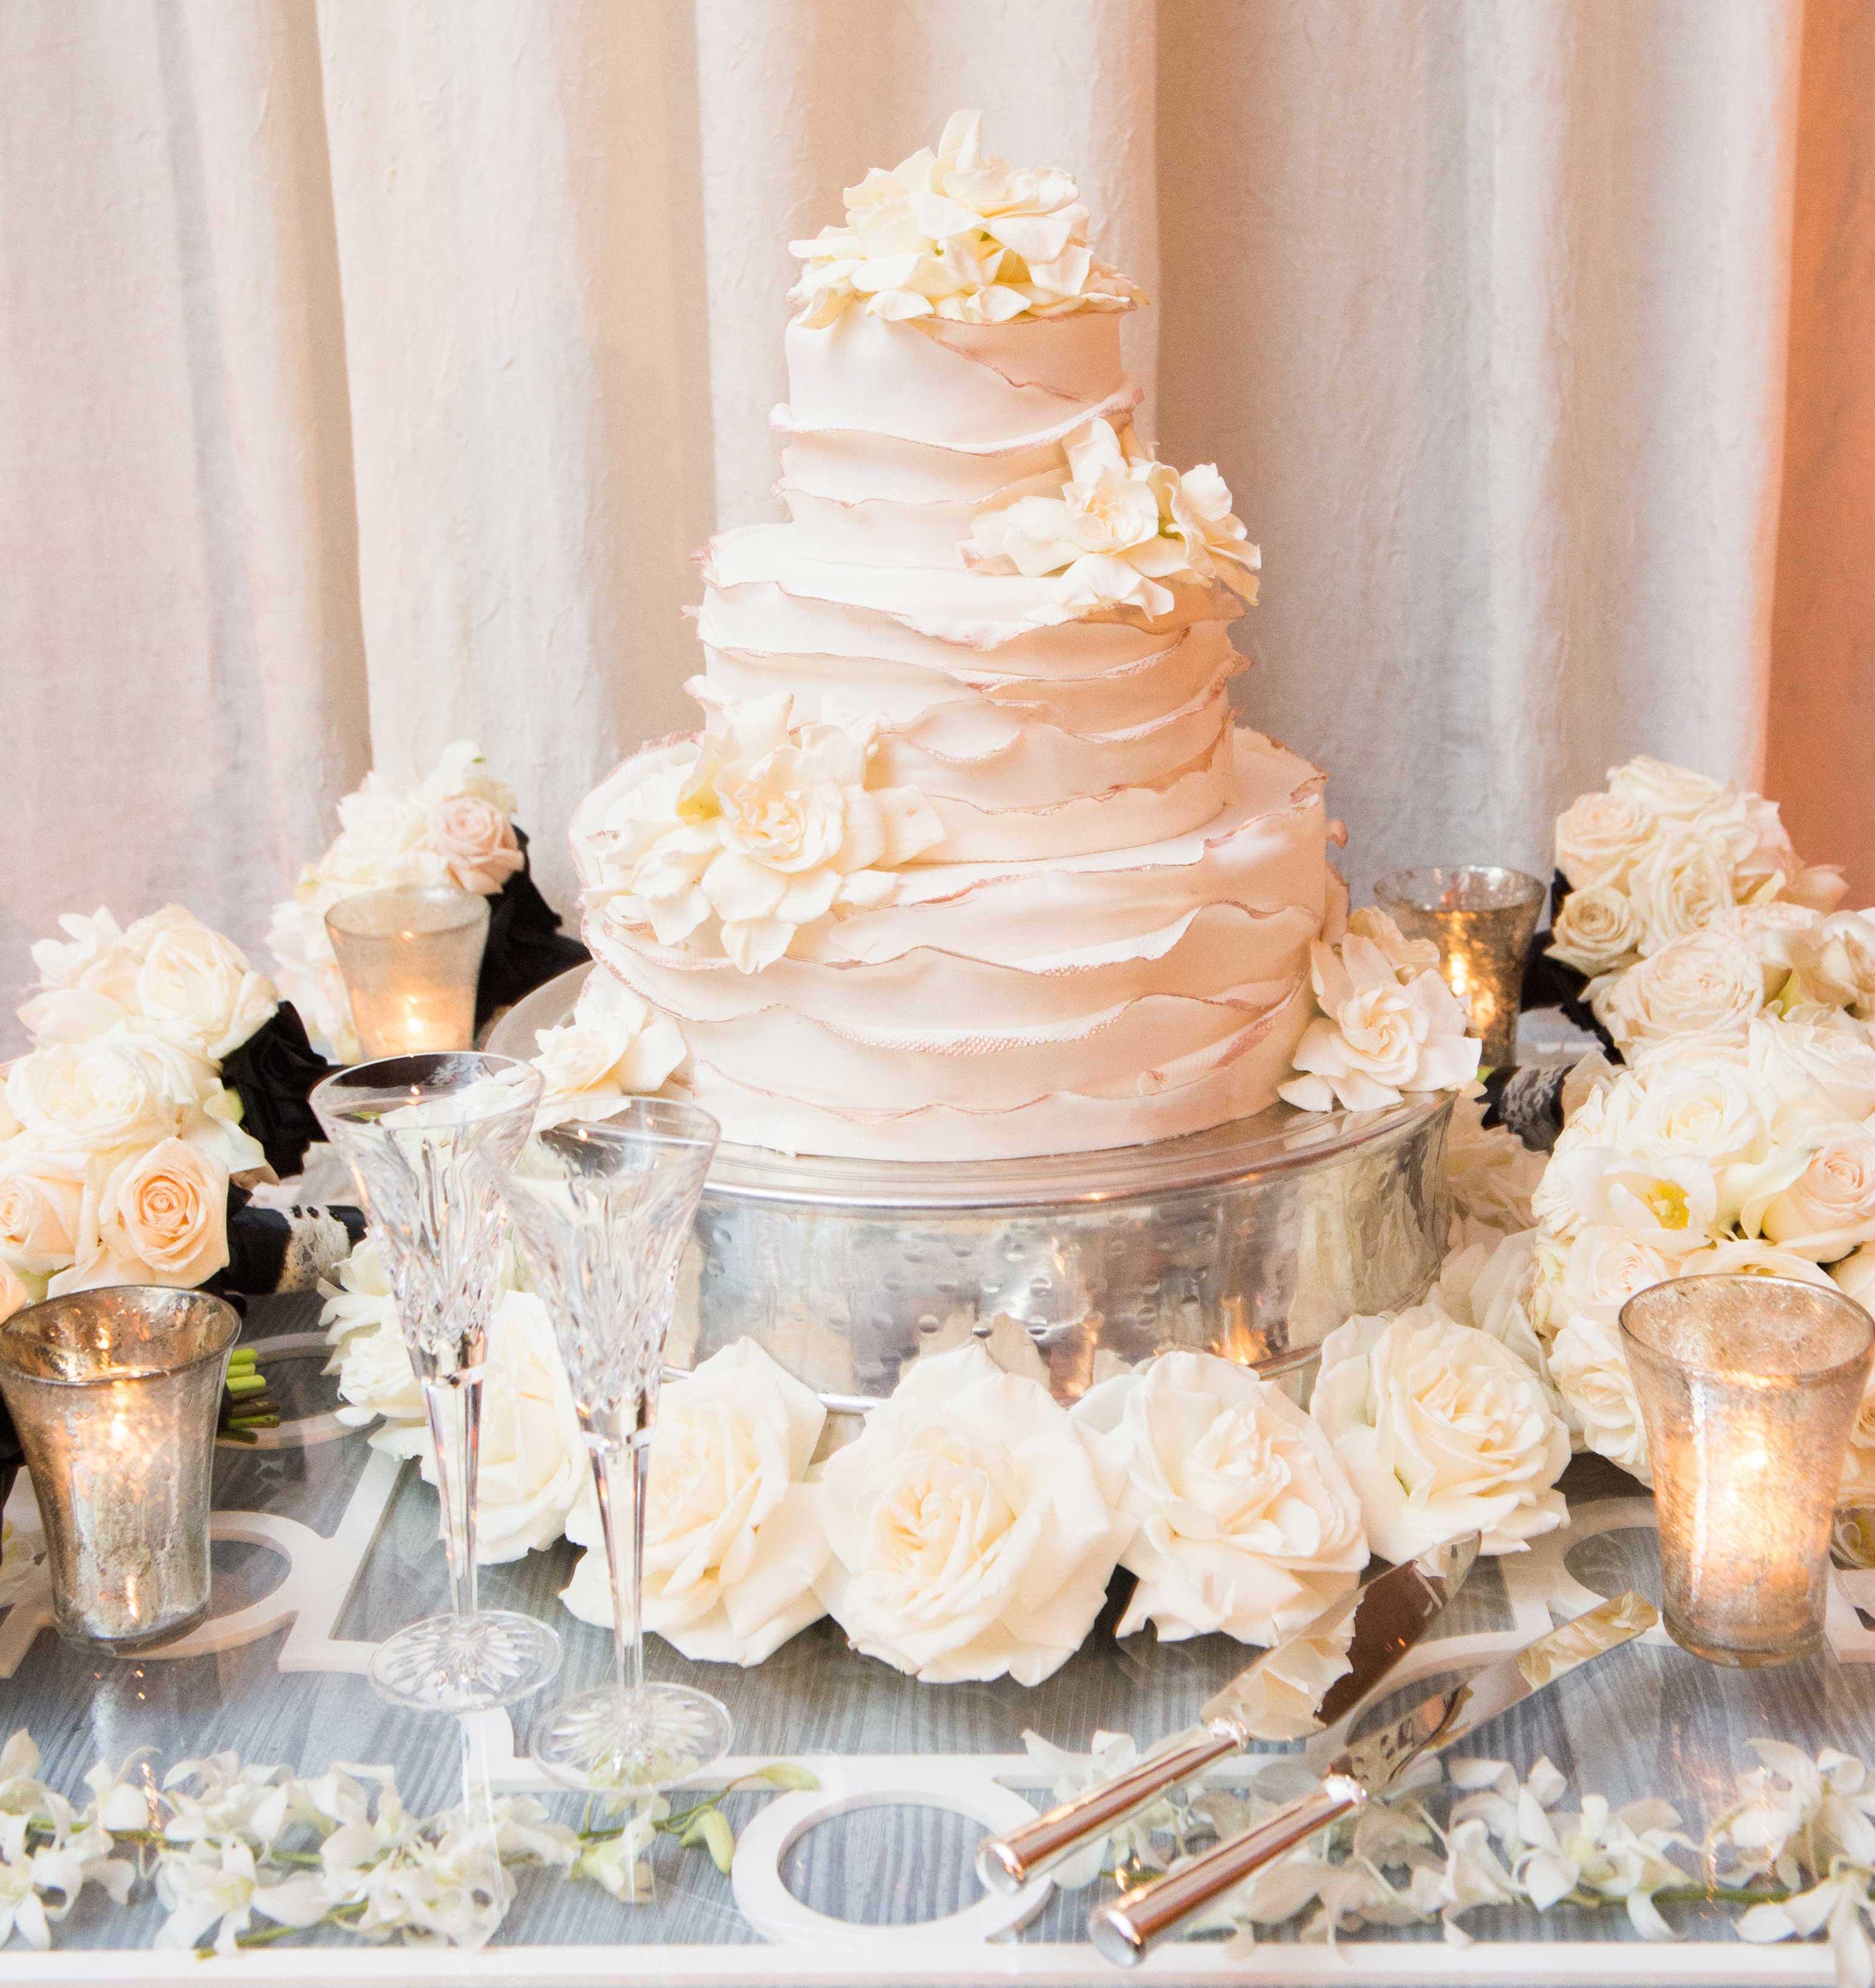 White wedding cake with ruffles and sugar flowers